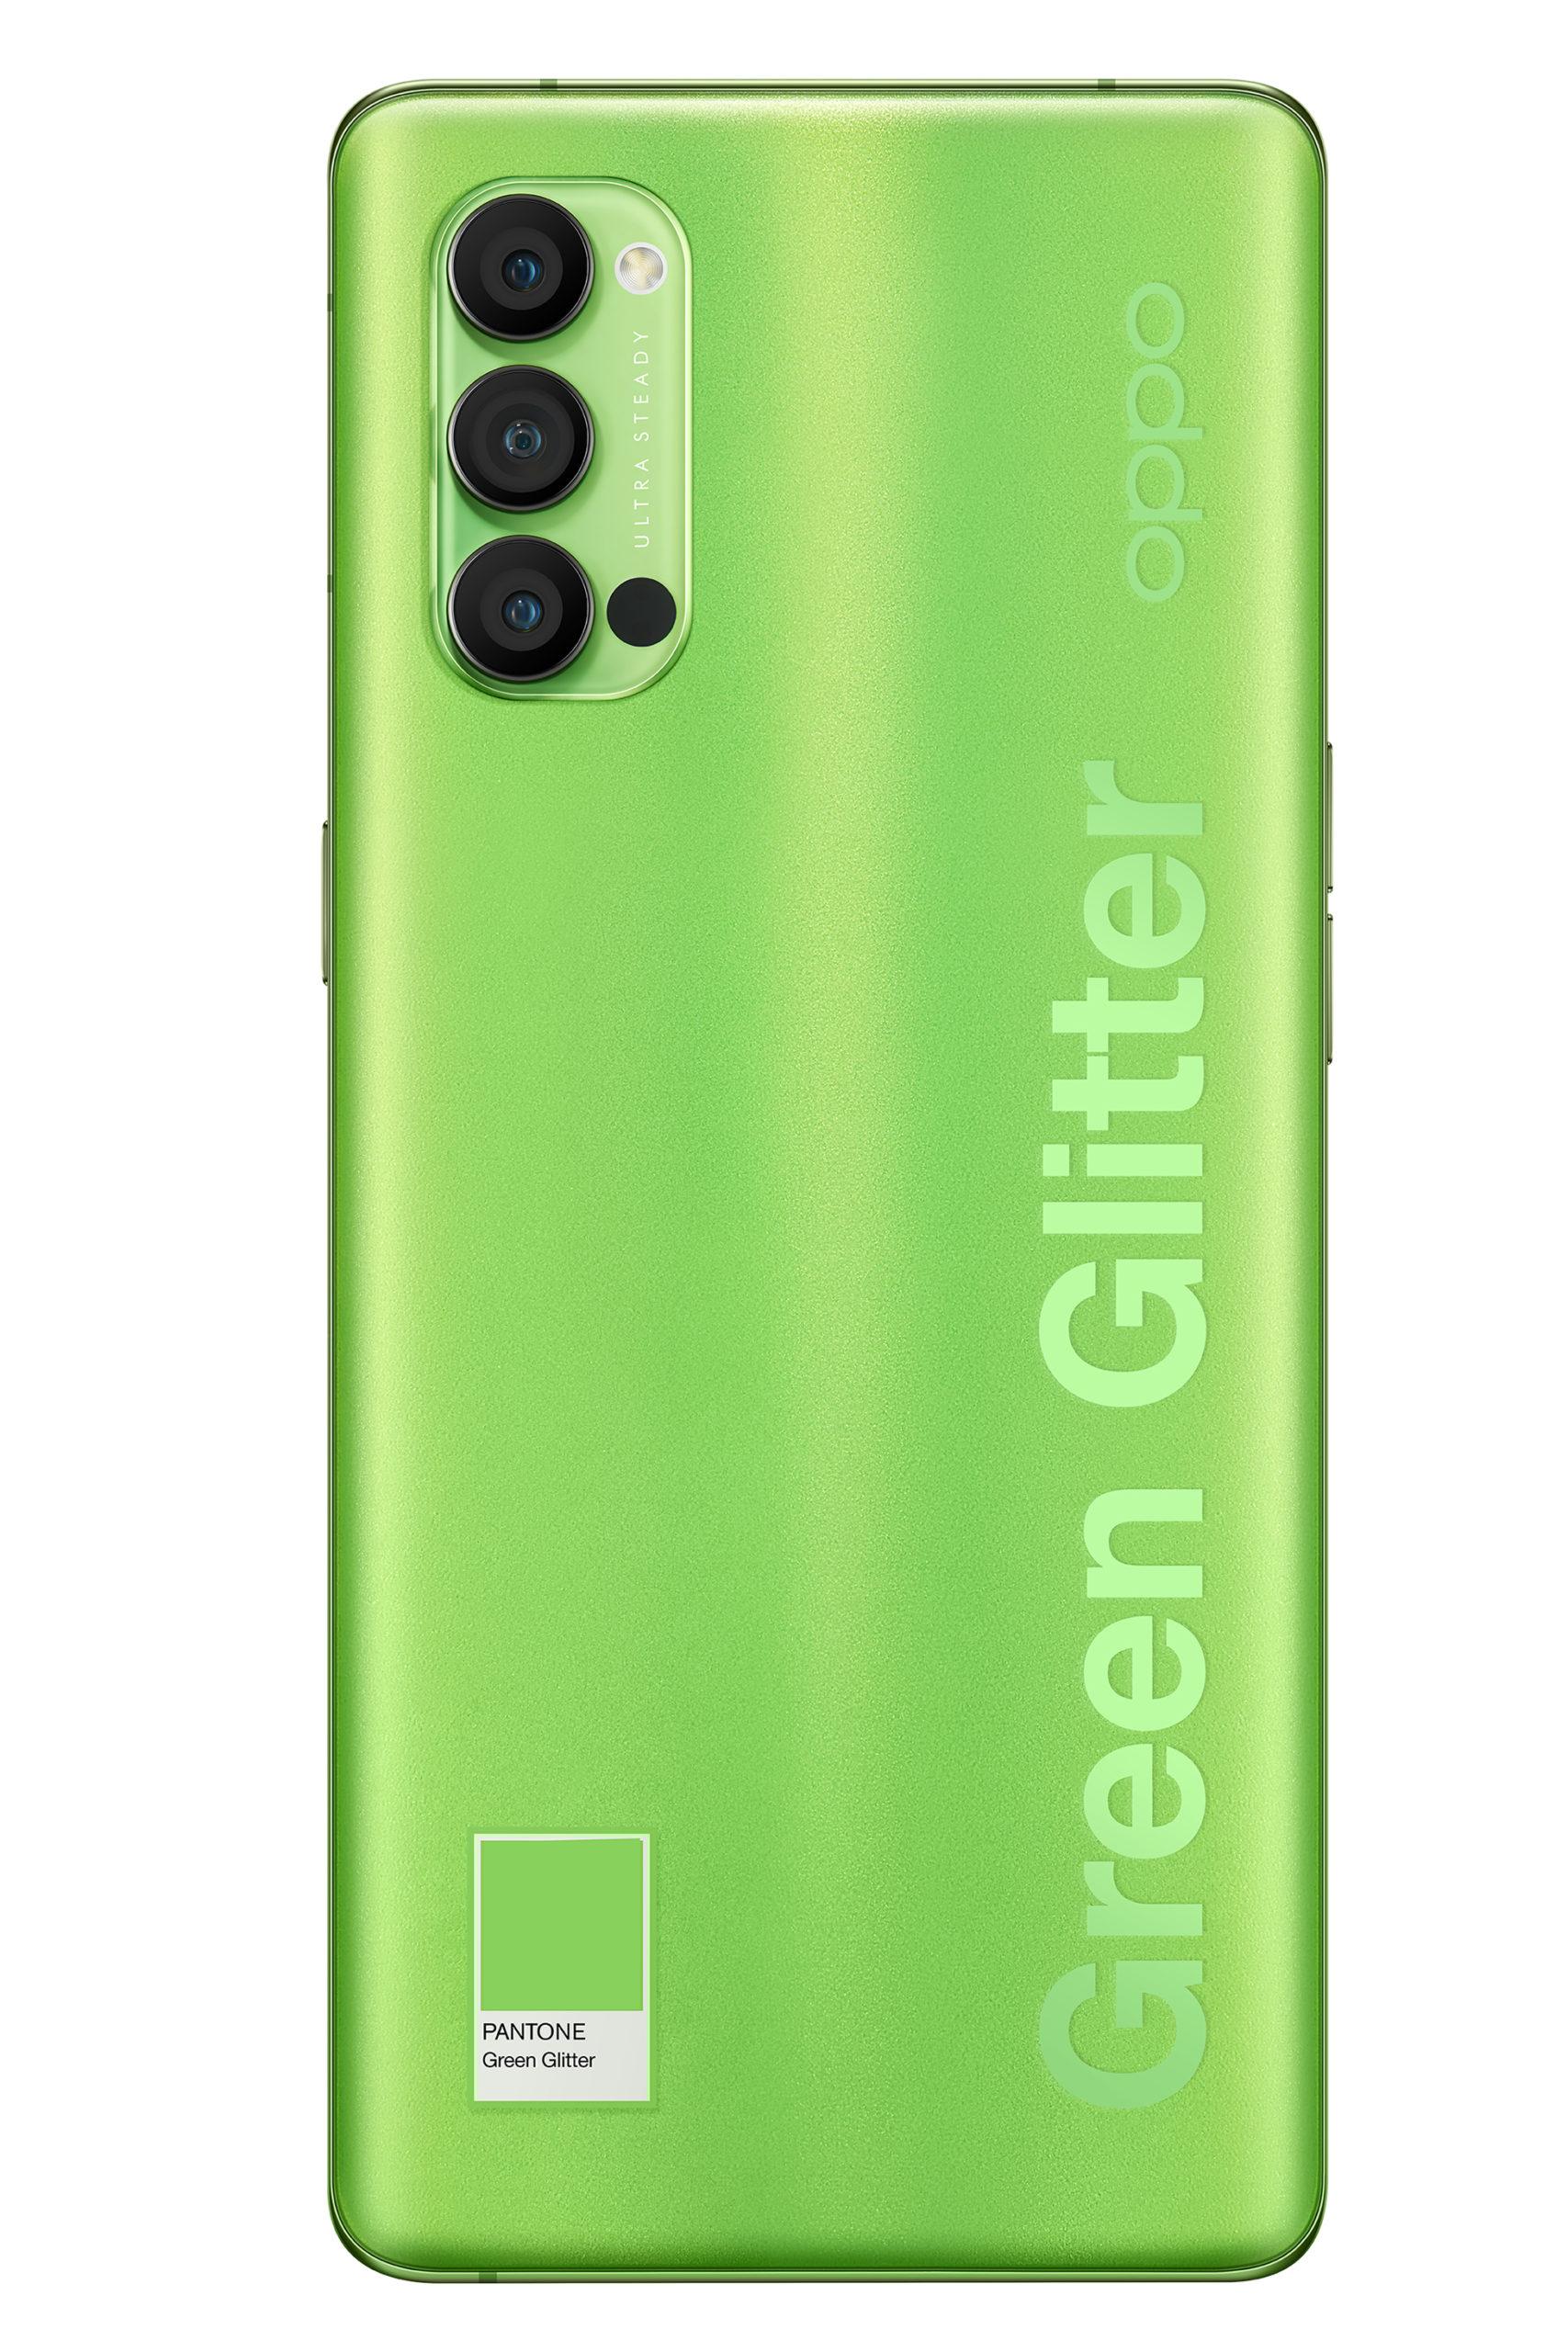 OPPO Reno4 Pro Green Glitter